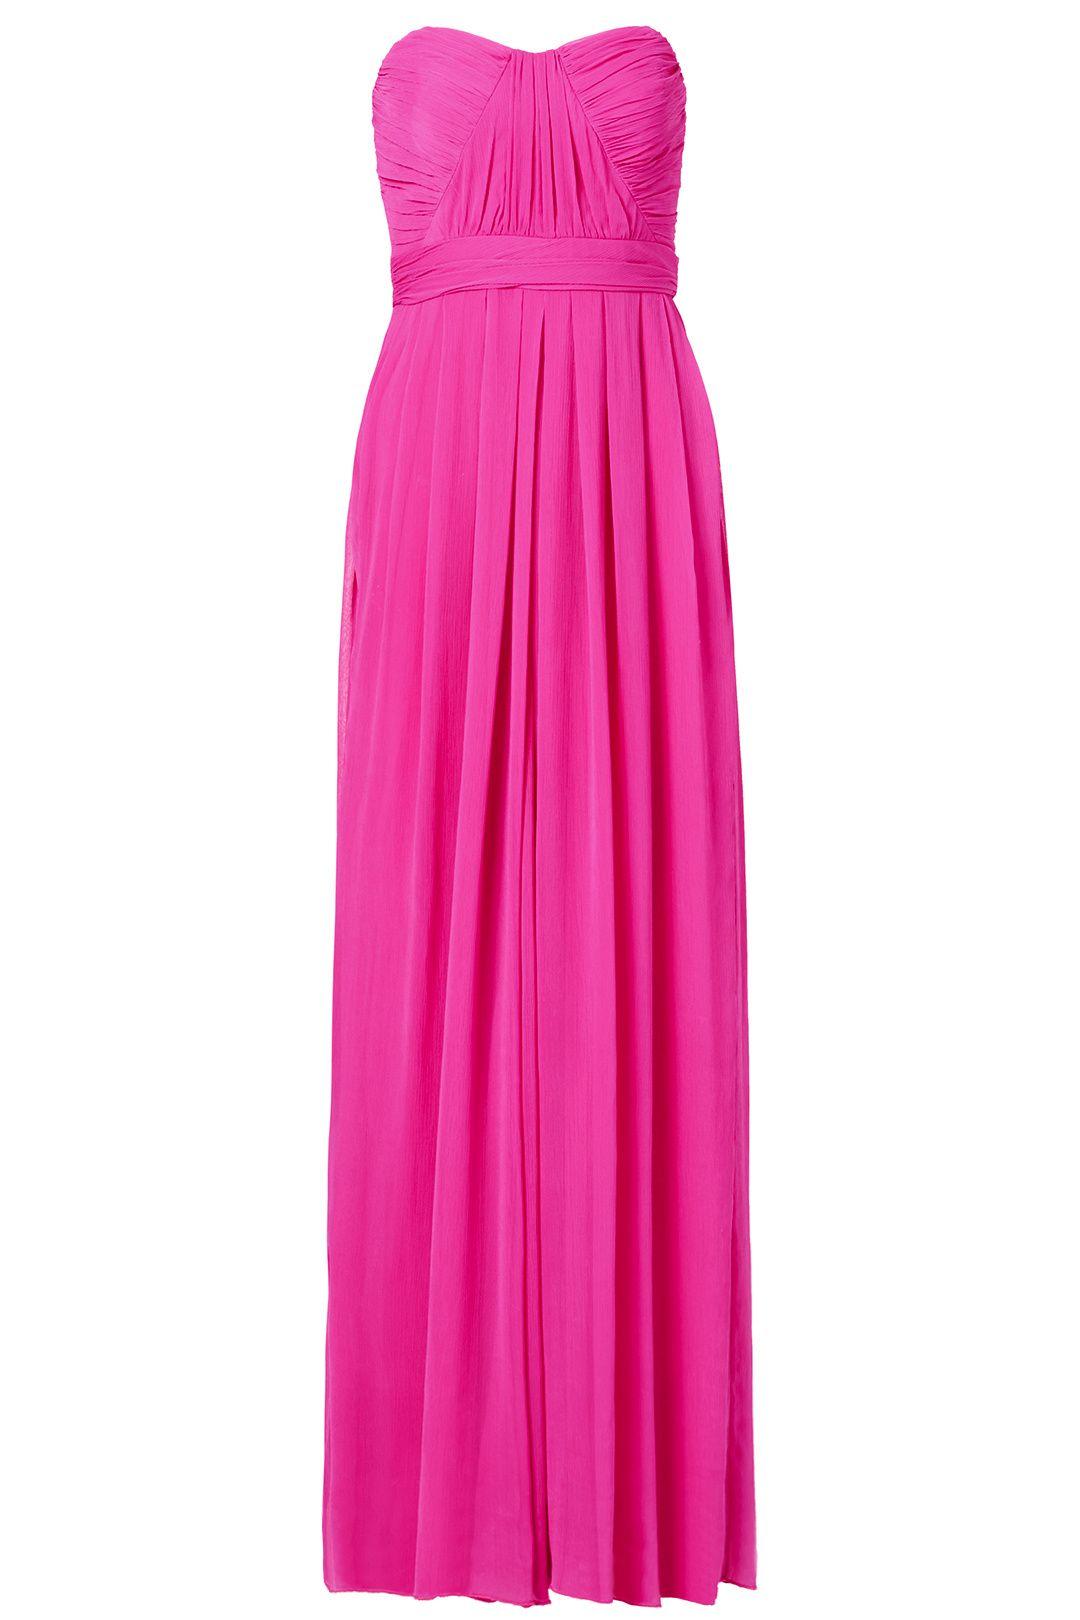 Fluorescent Chiffon Gown by Badgley Mischka. $80. RenttheRunway | A ...